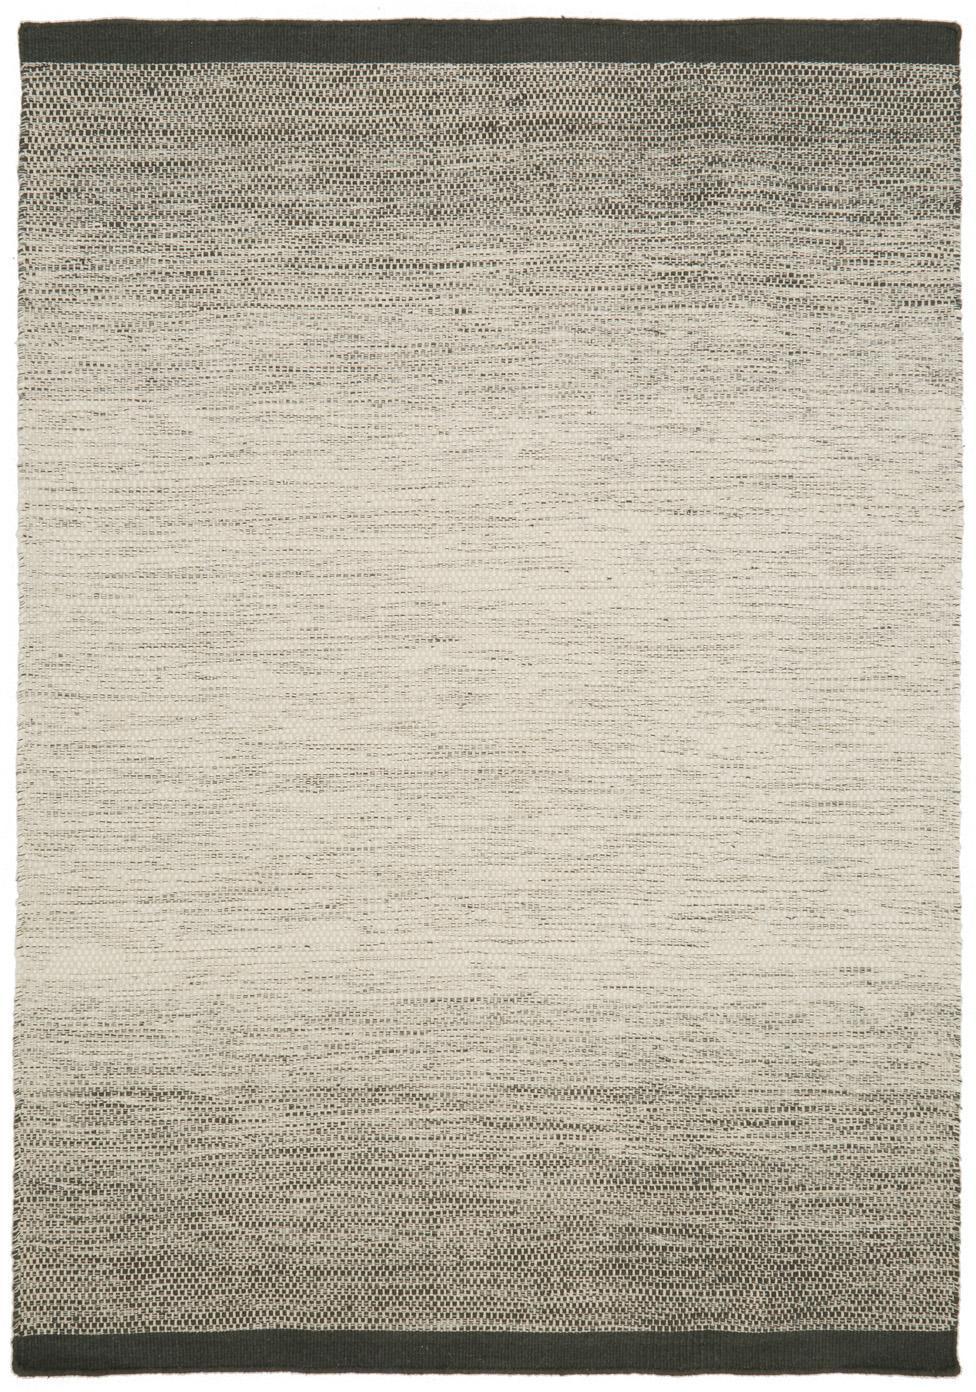 Handgeweven wollen vloerkleed Lule met kleurverloop in beige/groen, 70% wol, 30% katoen, Donkergroen, beige, B 140 x L 200 cm (maat S)